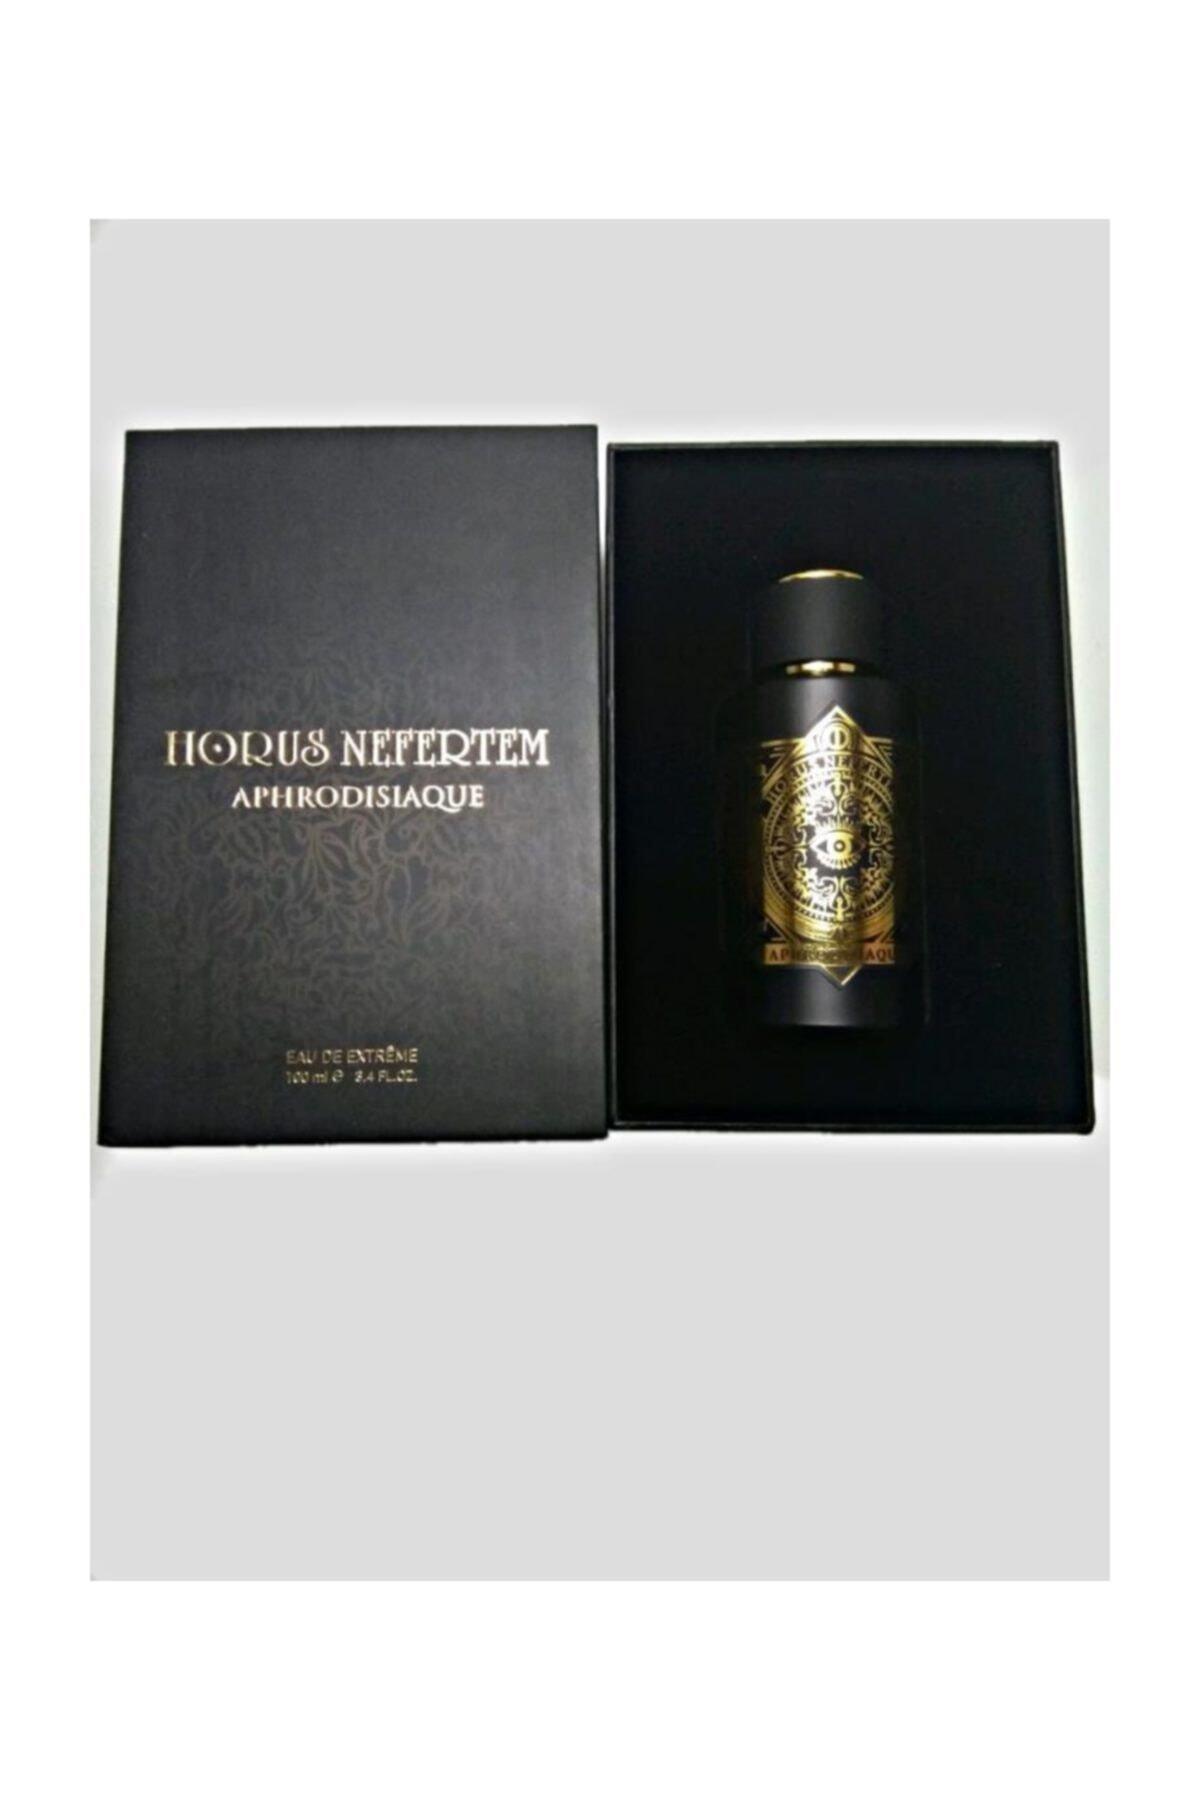 Horus Nefertem Erkek Parfümü Aphrodisiaque Edp 100 Ml 2